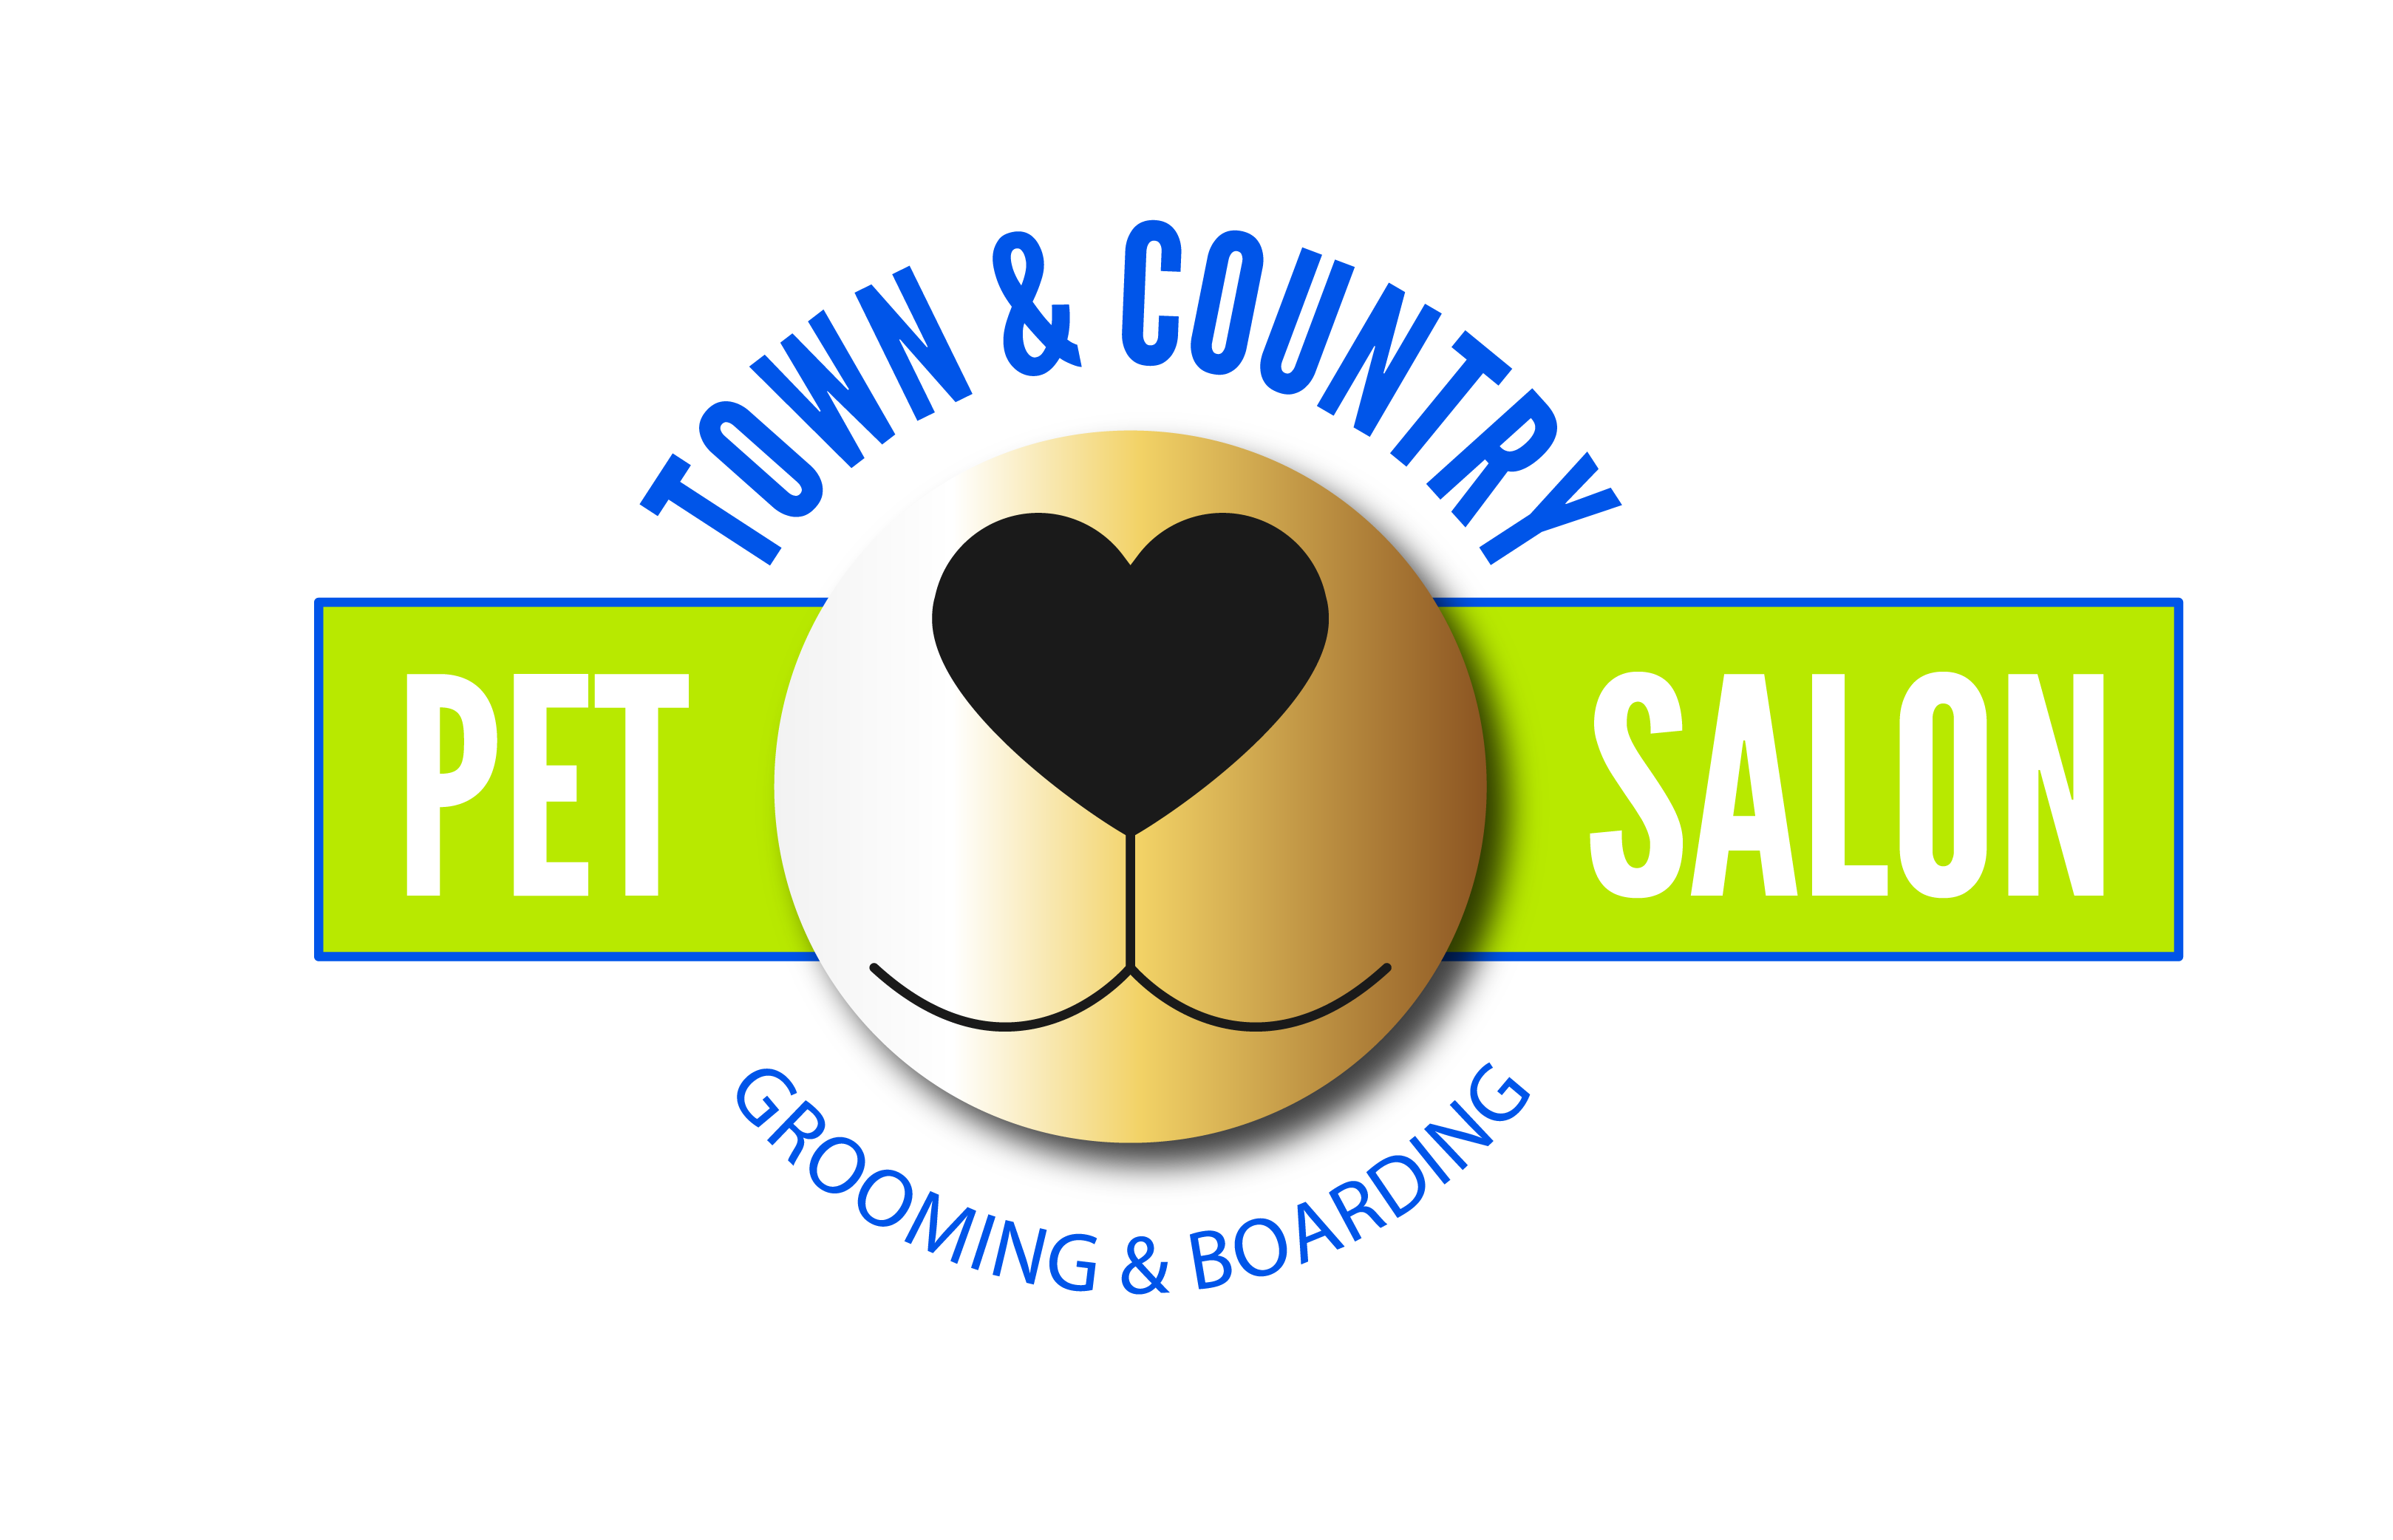 Town & Country Pet Salon